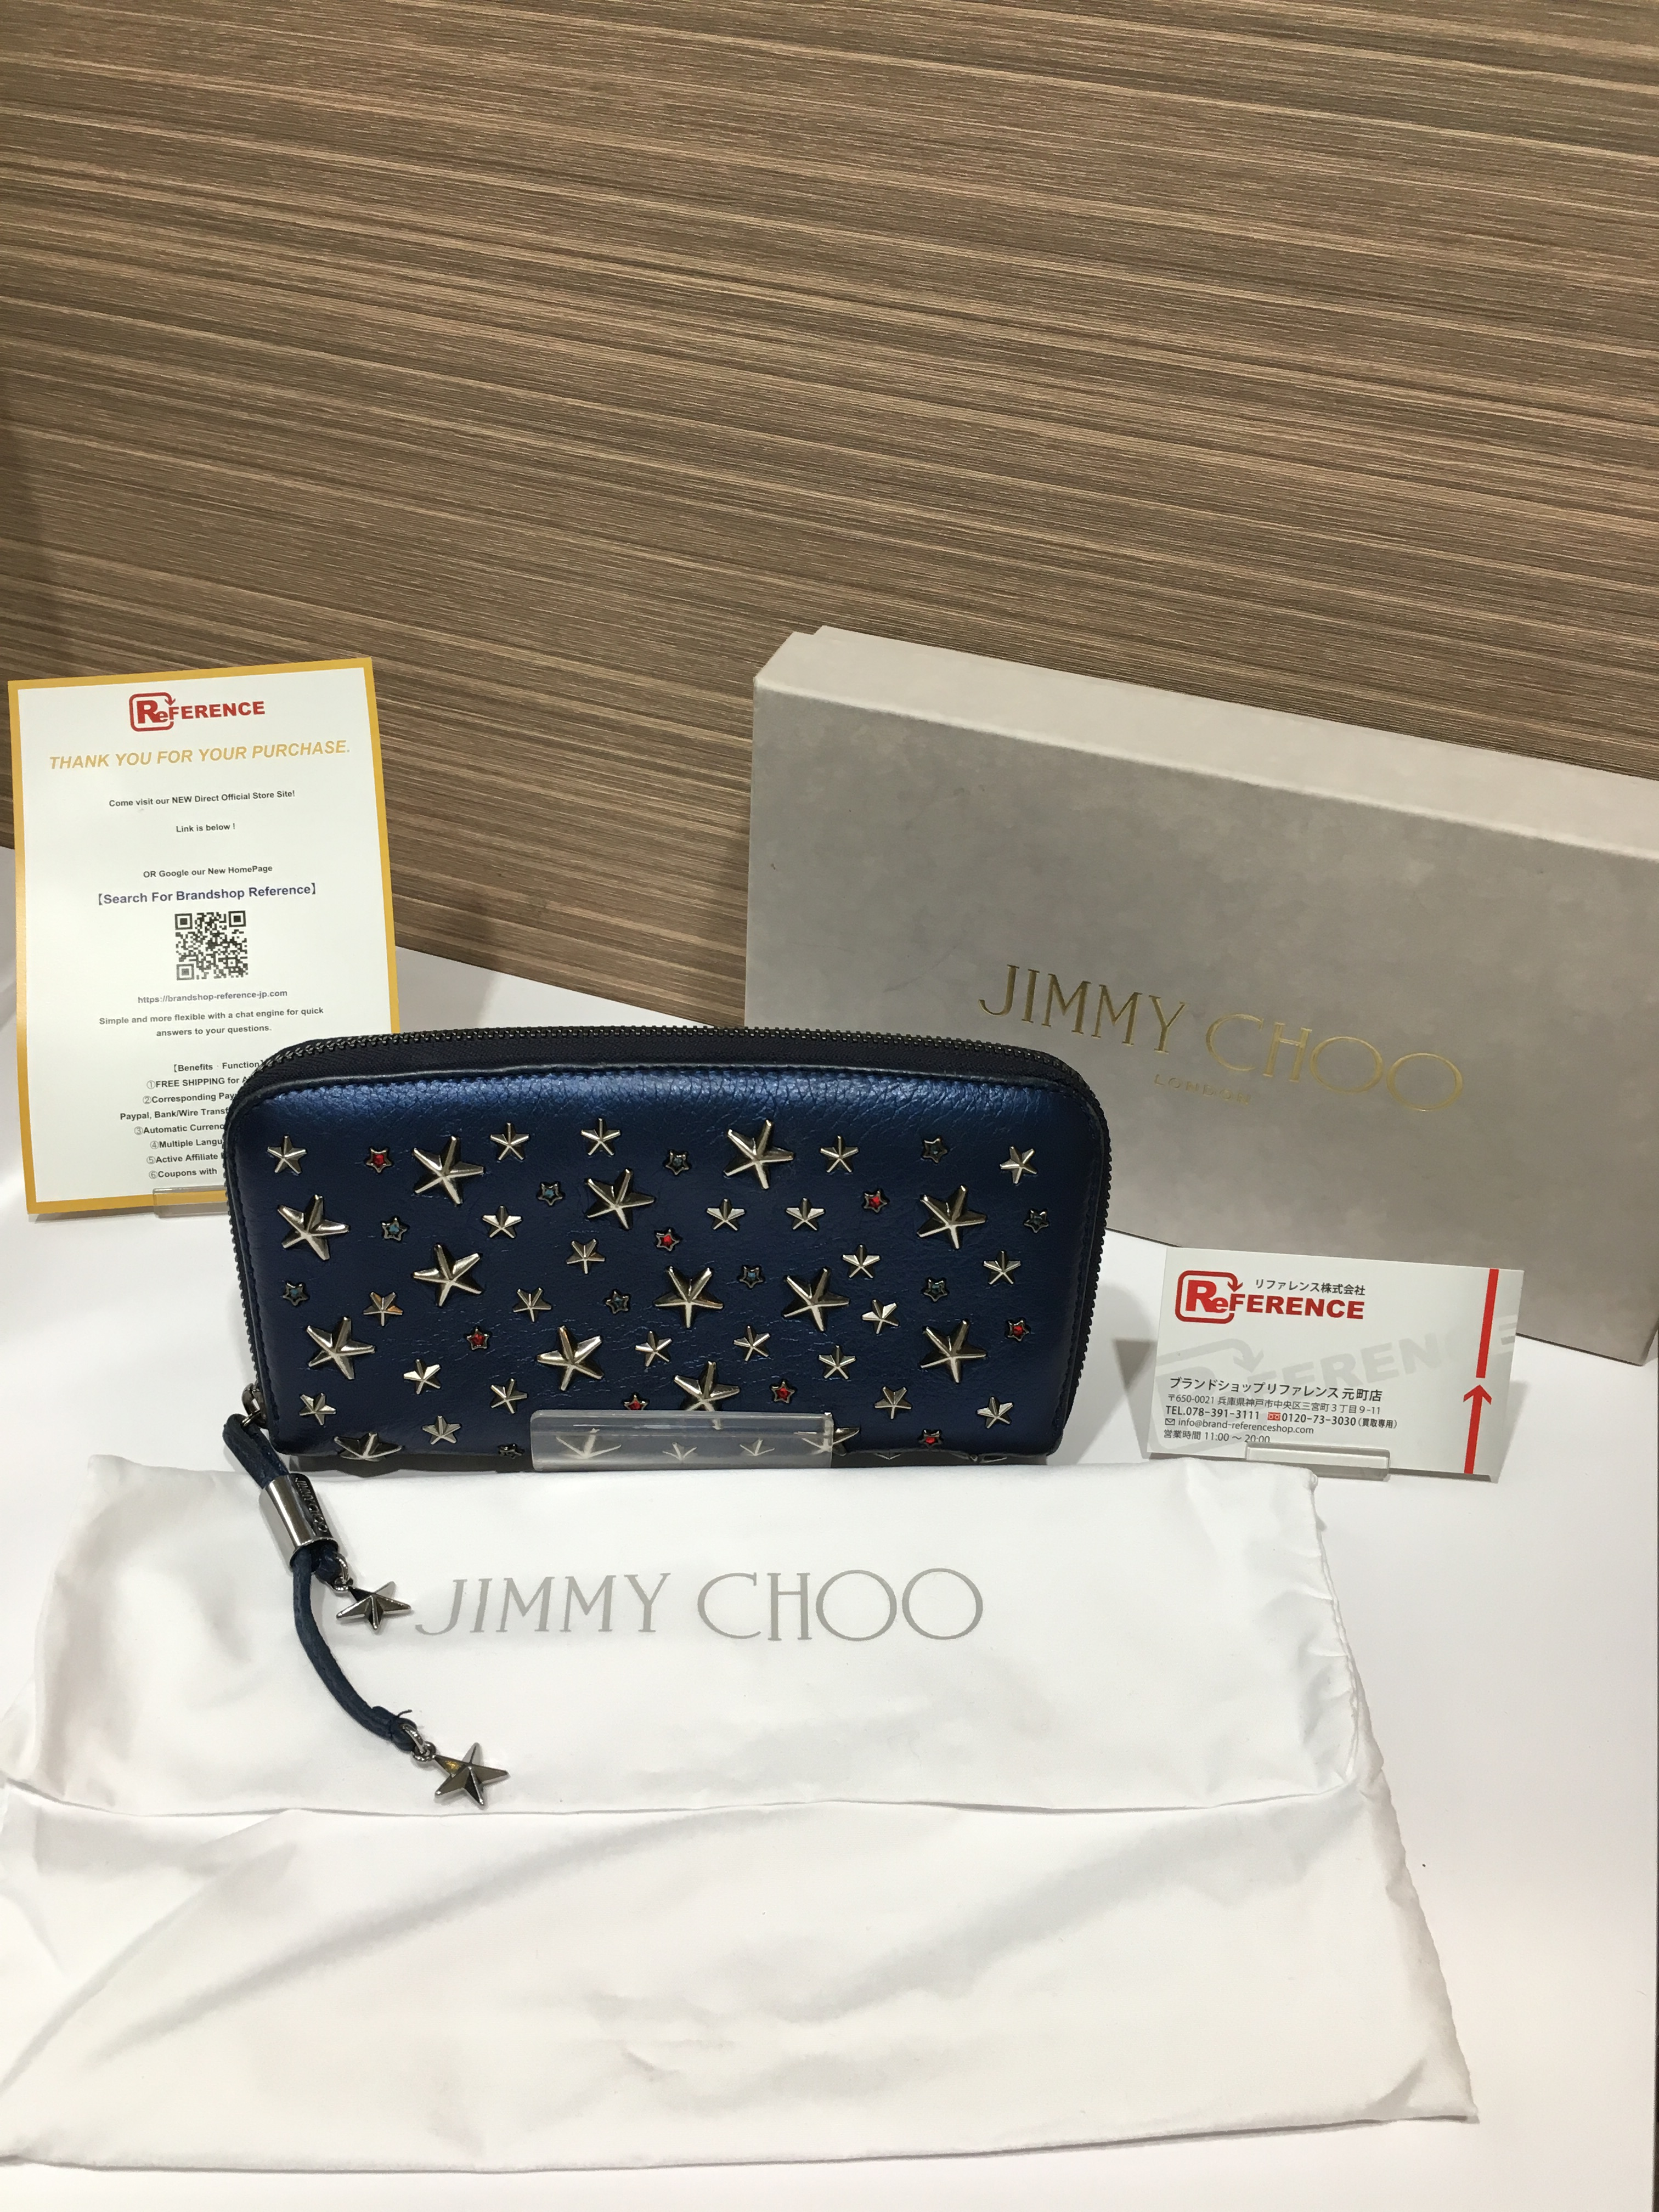 JIMMY CHOO✨ジミーチュウのスターとラインストーンの長財布(型番:0C5235)を高価買取🐶